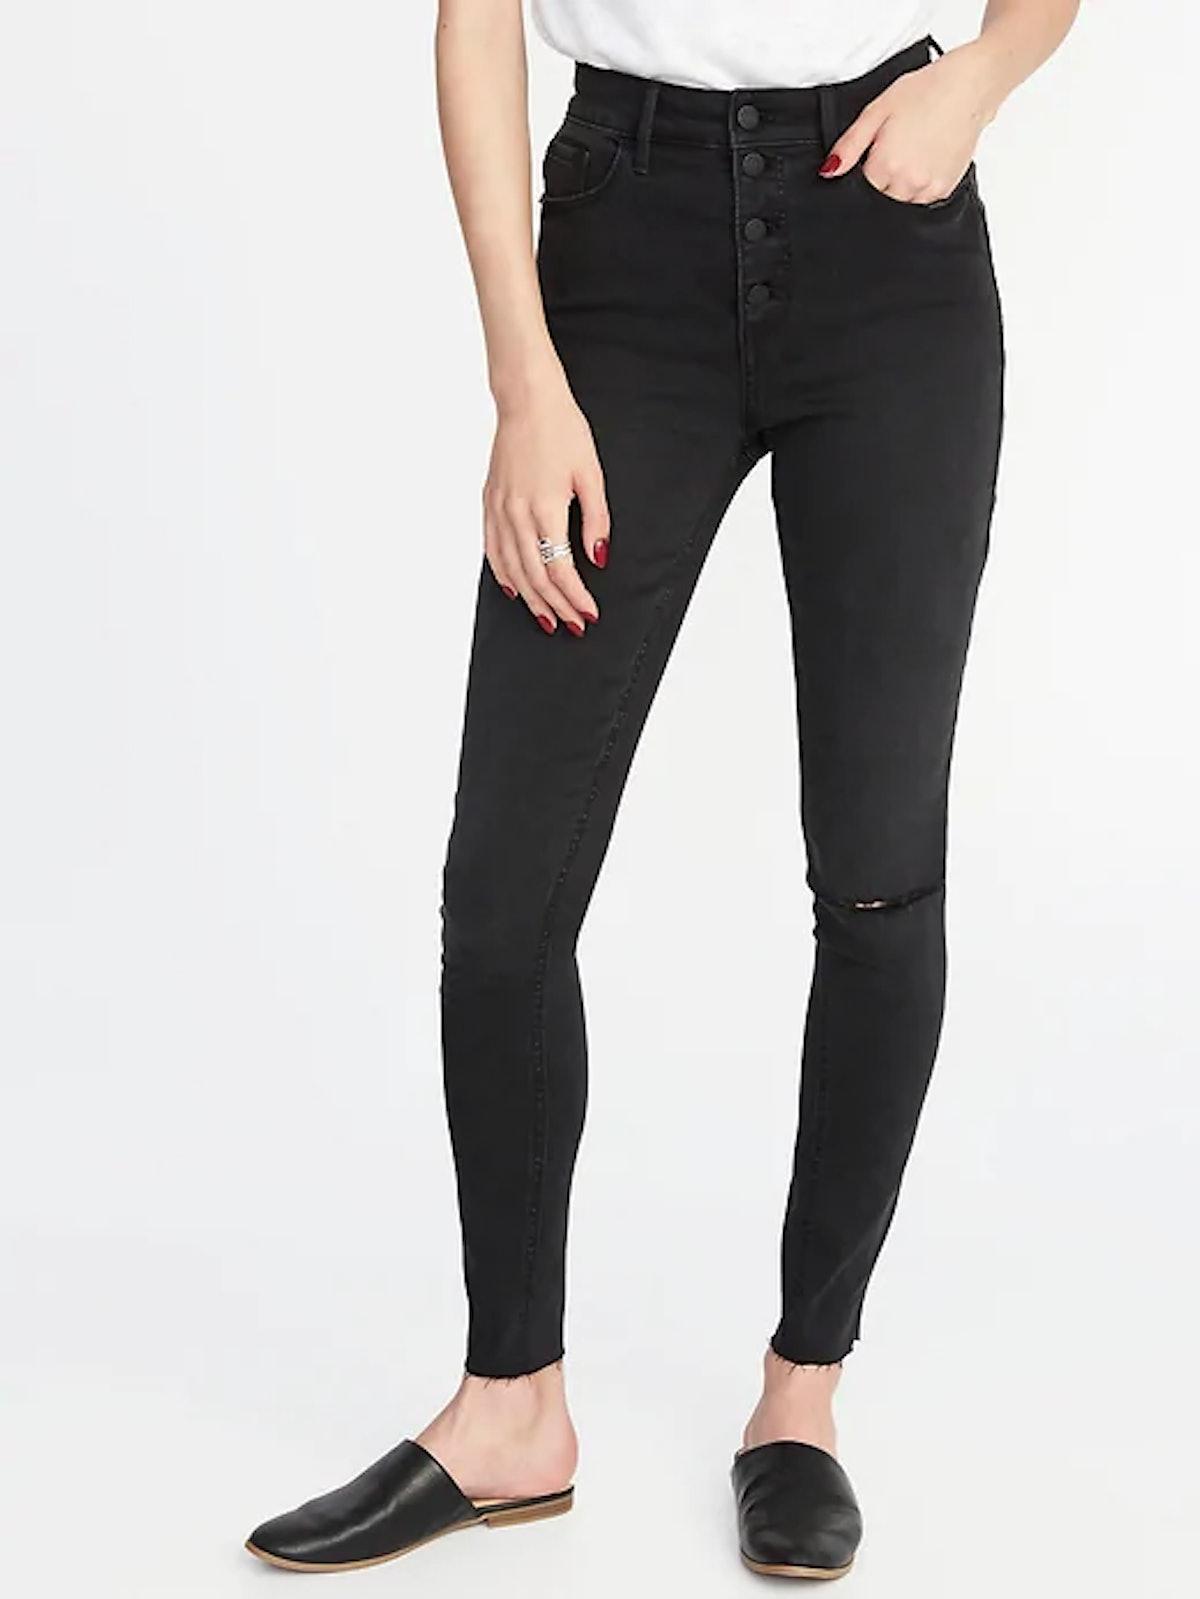 High-Rise Secret-Slim Pockets Rockstar Ankle Jeans for Women